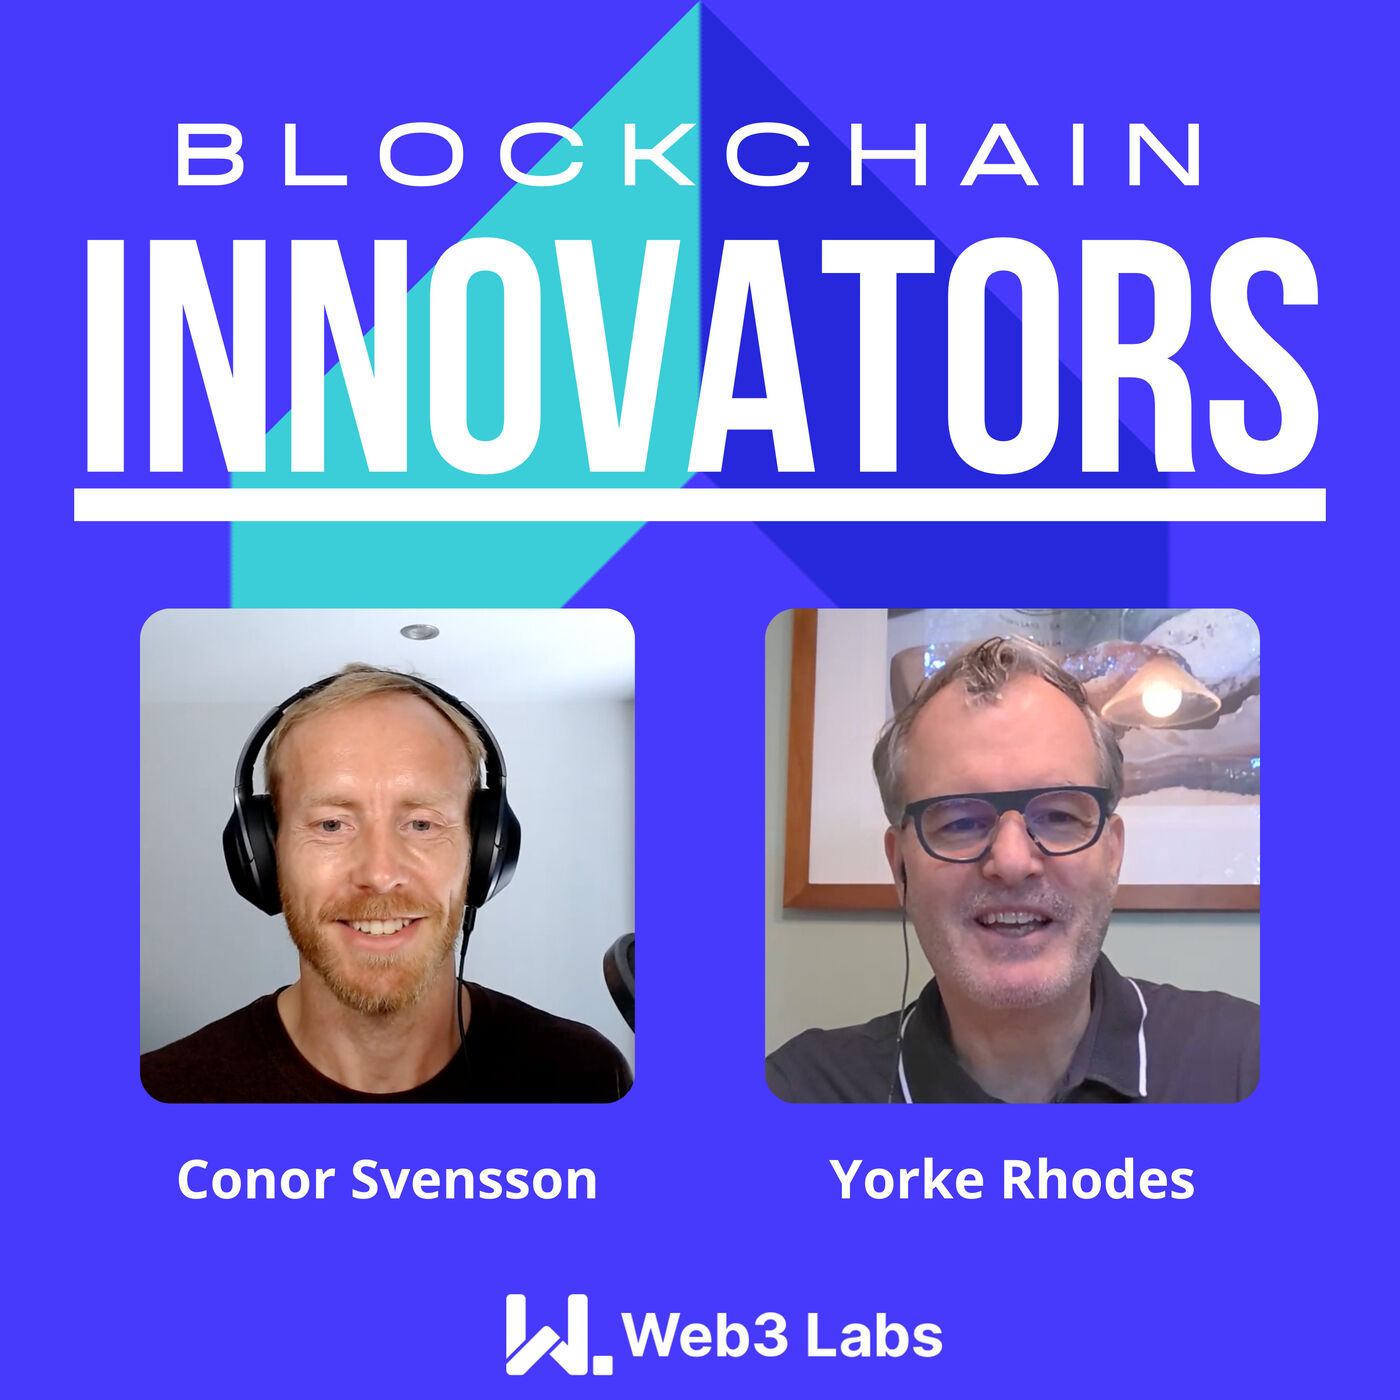 Blockchain Innovators - Conor Svensson and Yorke Rhodes